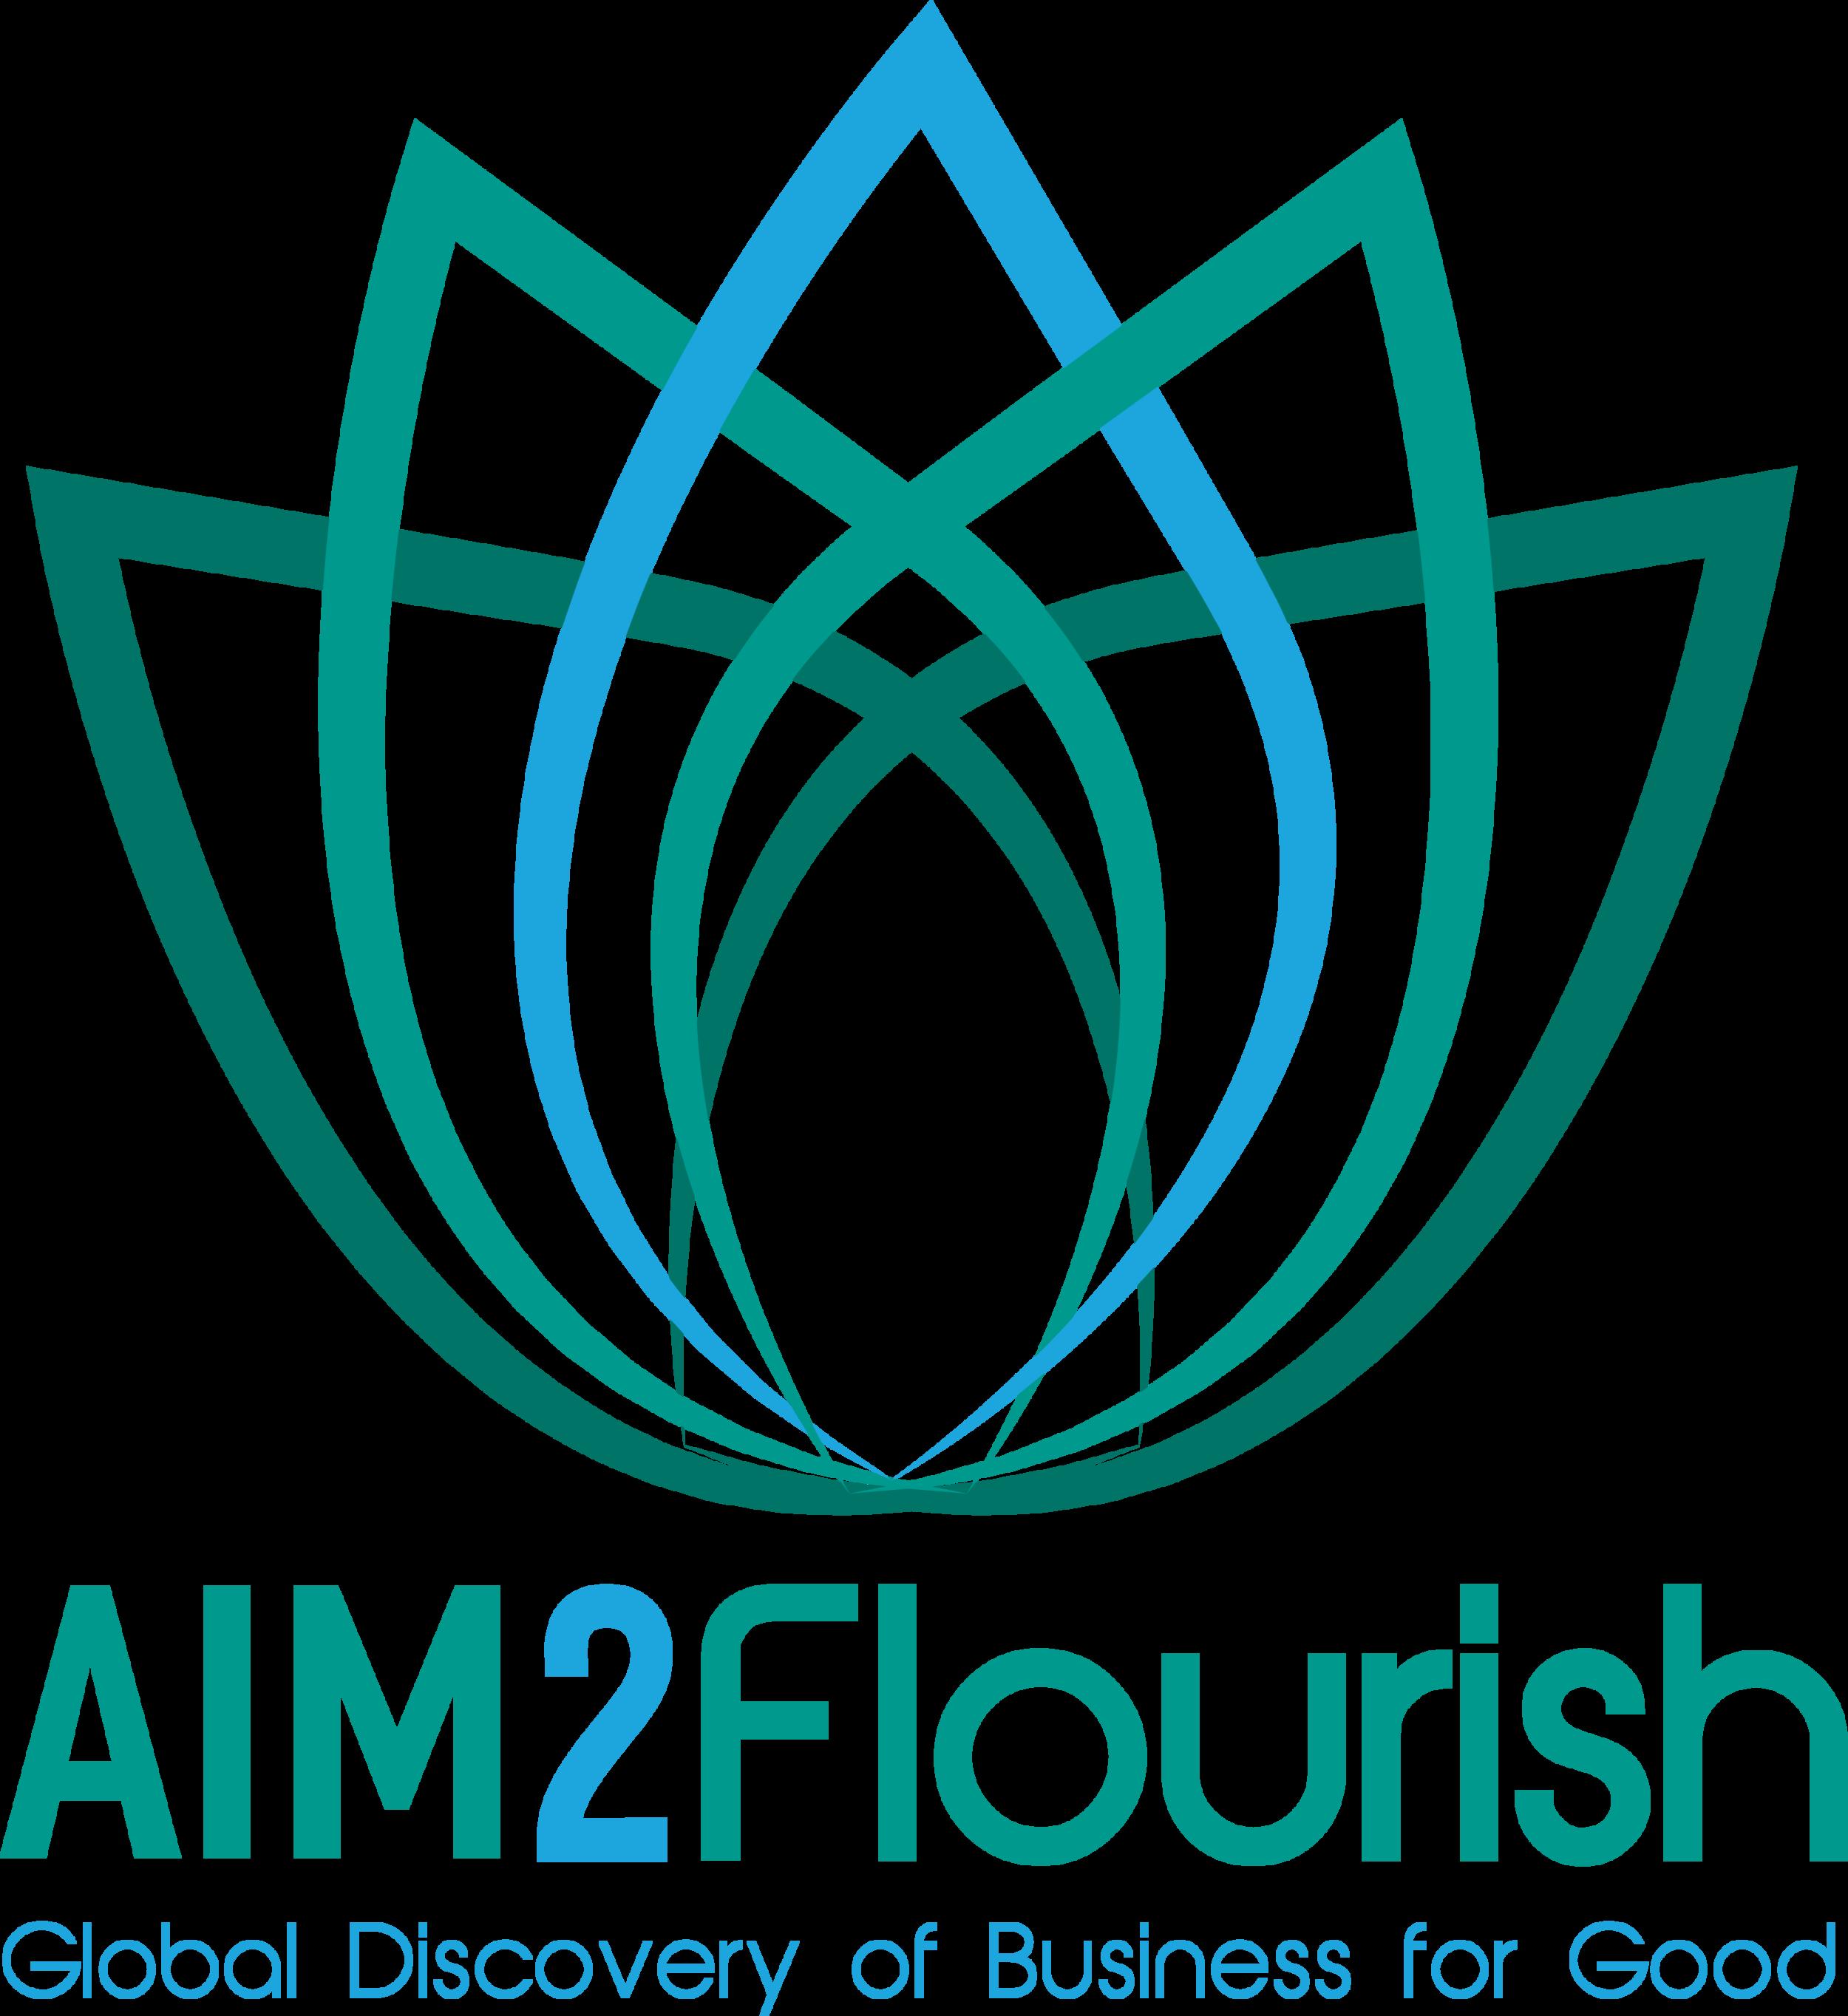 a2f-logo-vertical.png